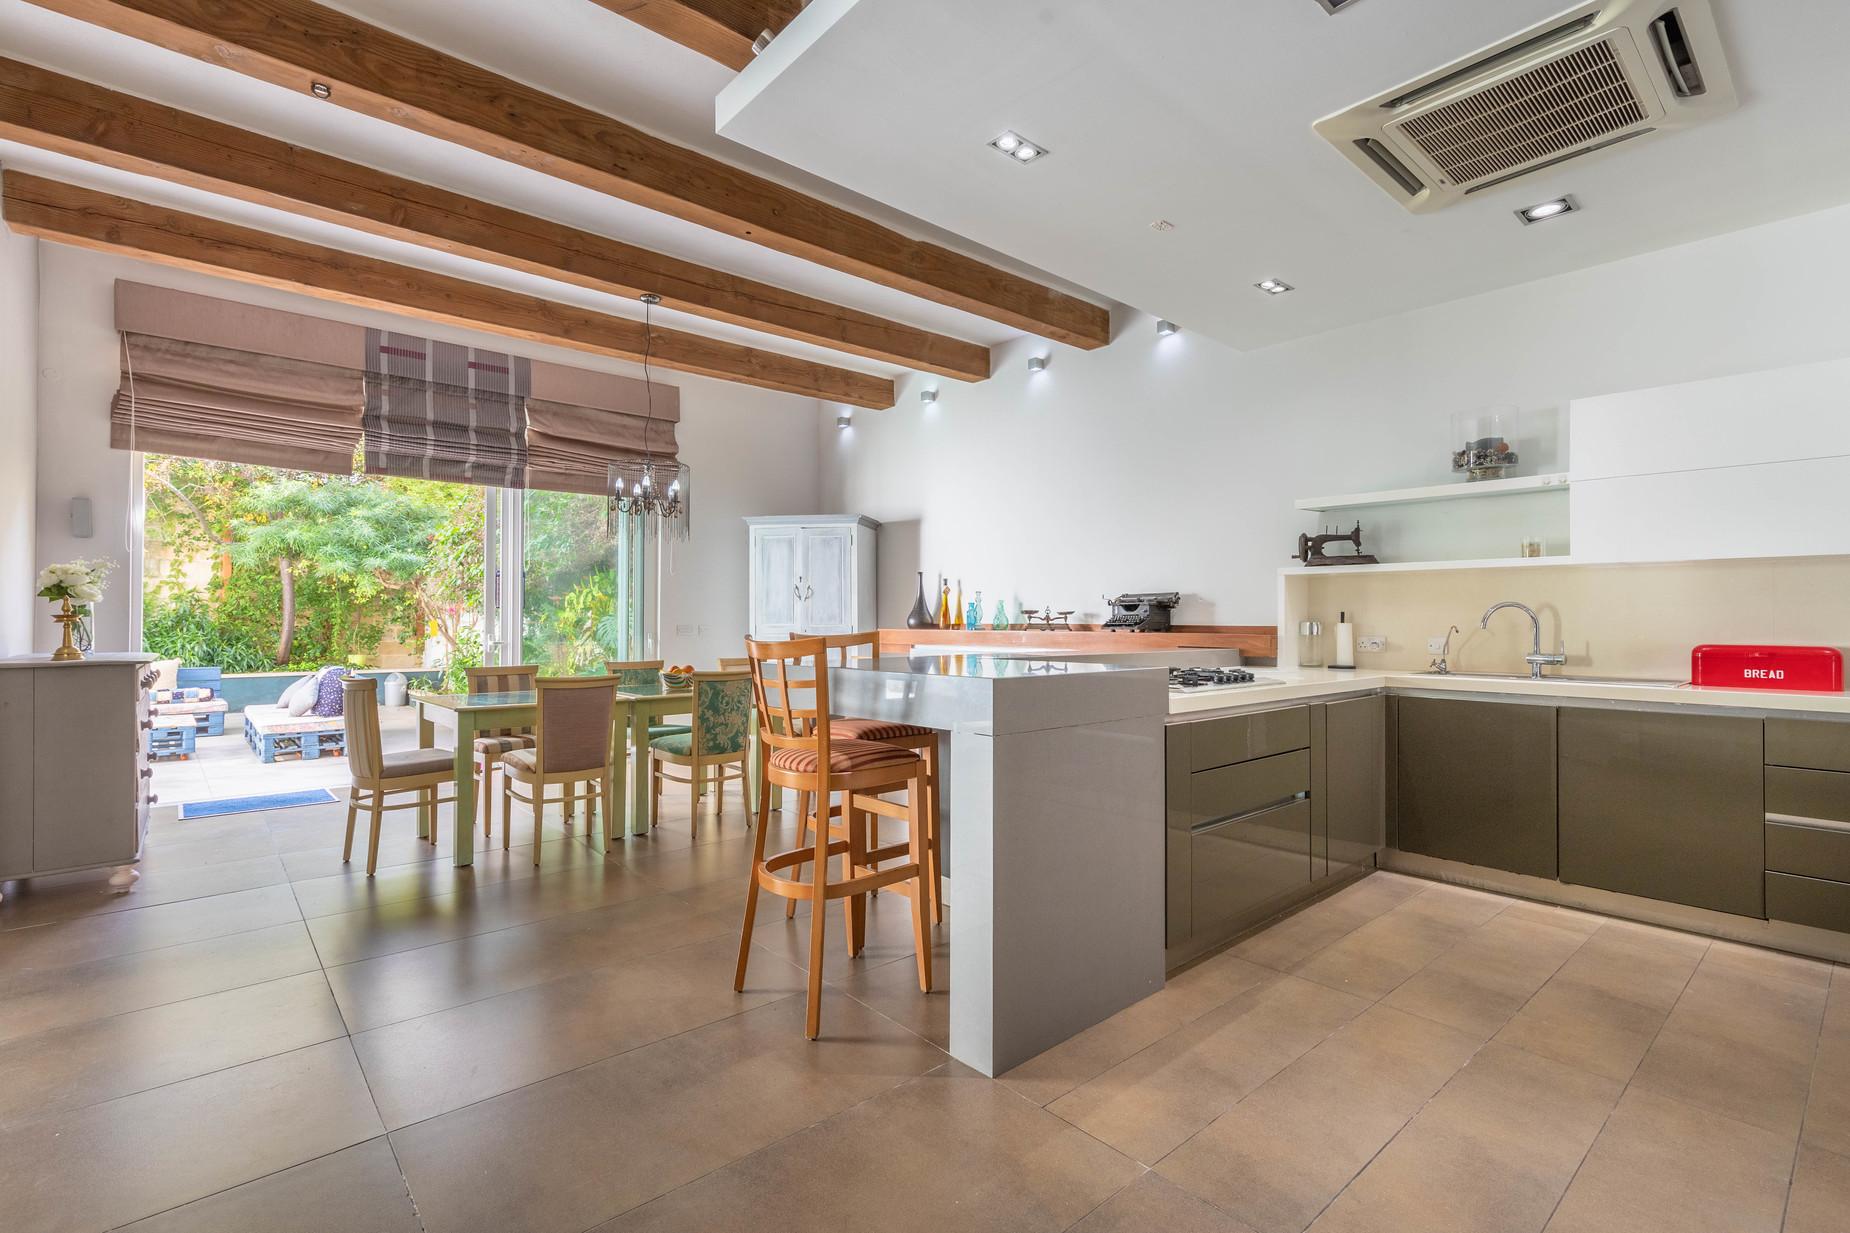 5 bed Villa For Sale in Zebbug, Zebbug - thumb 8